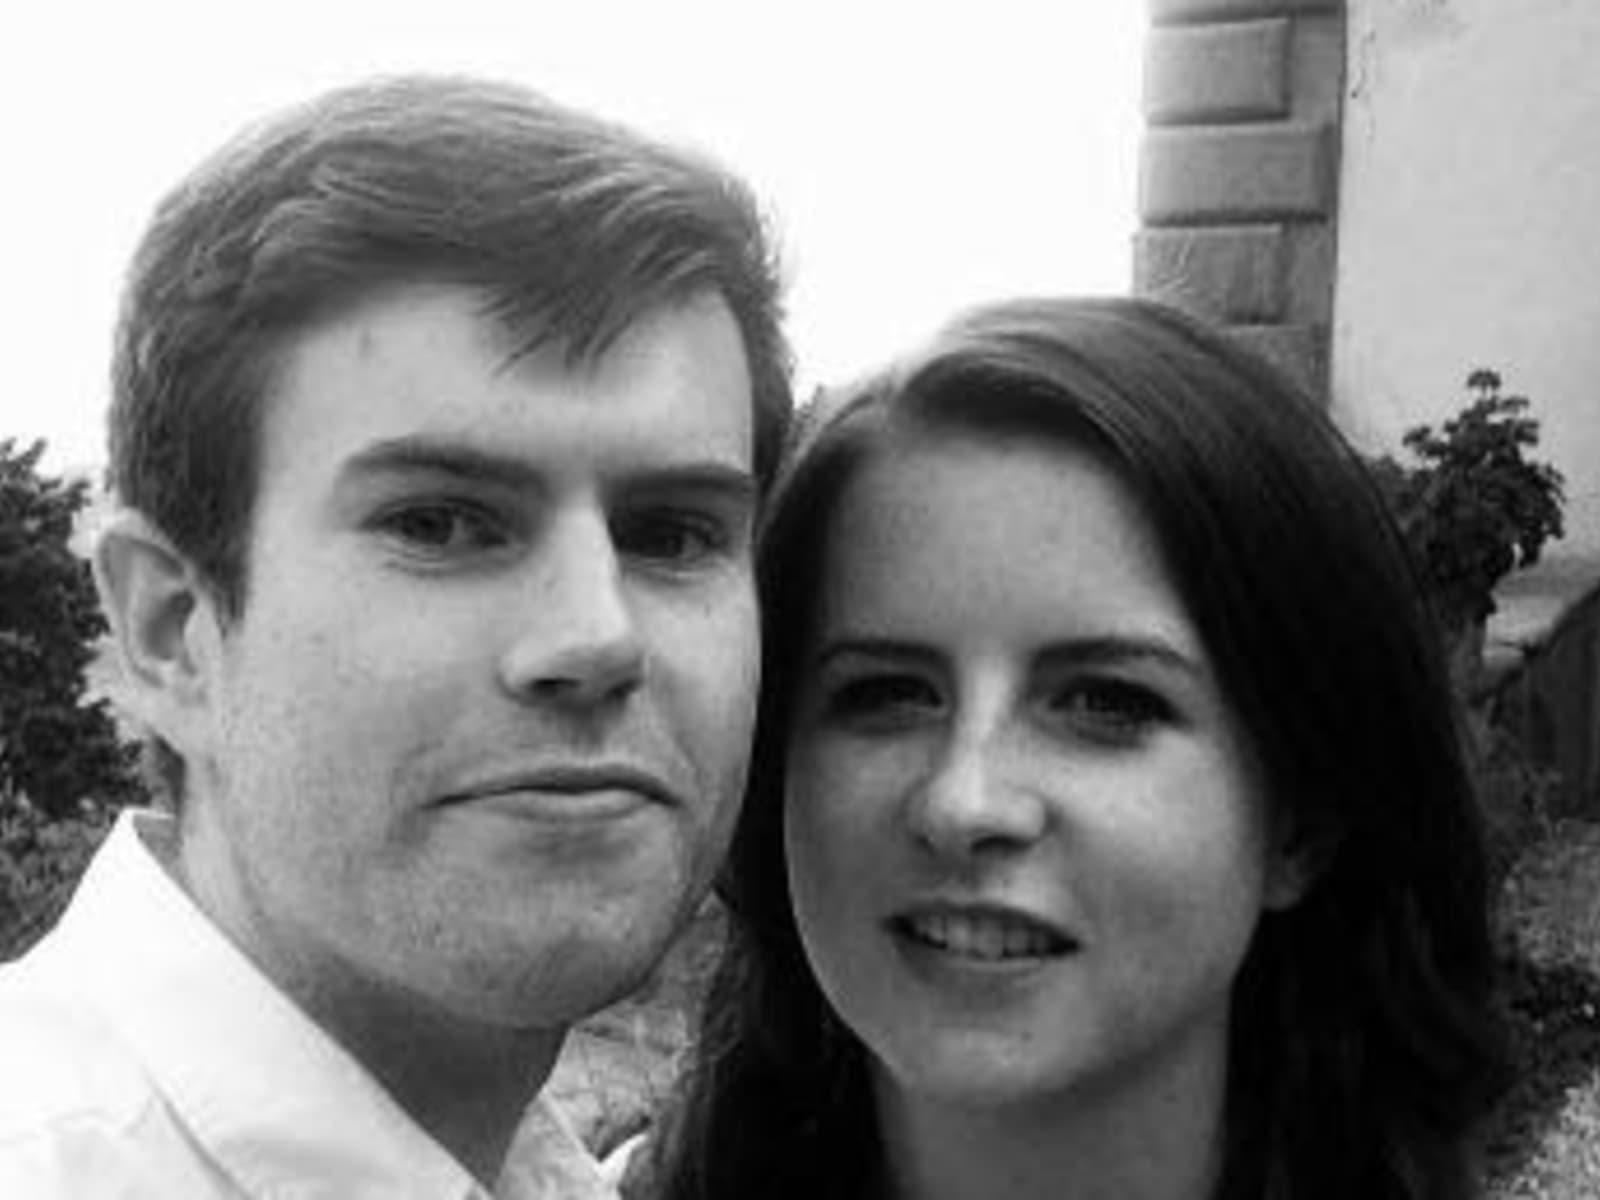 Kaylie & John from Reading, United Kingdom